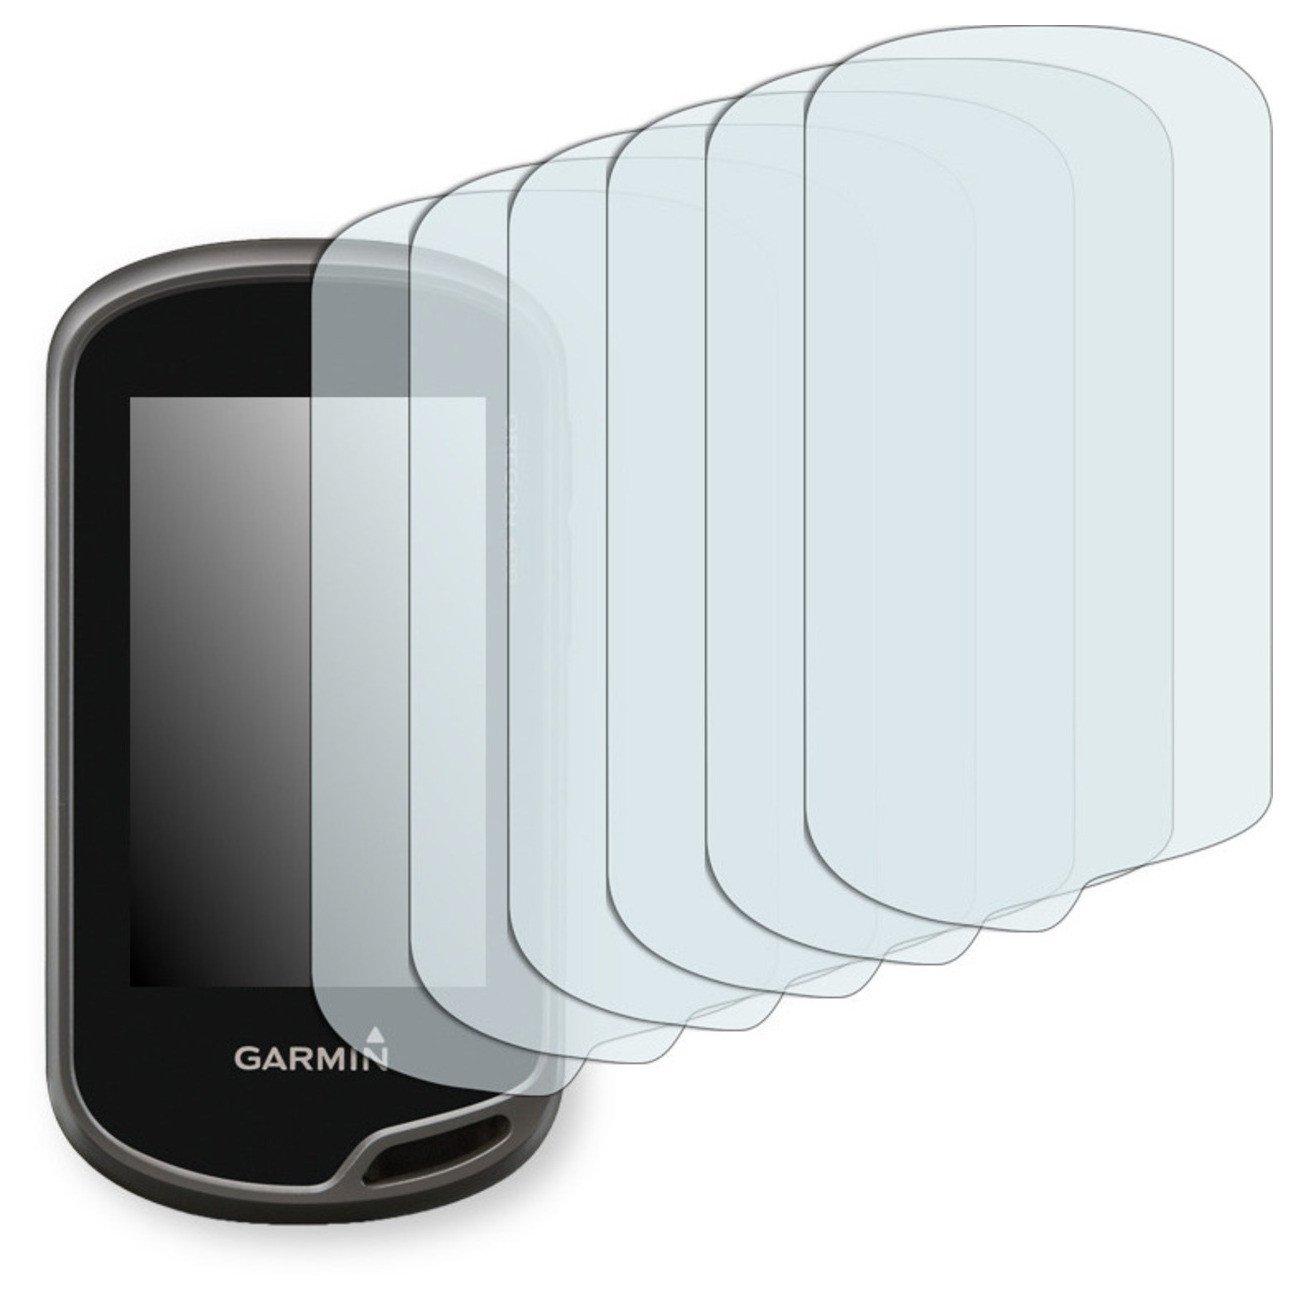 GOLEBO 6x Anti-Glare screen protector for Garmin Oregon 650t (Anti-Reflex, Air pocket free application, Easy to remove)